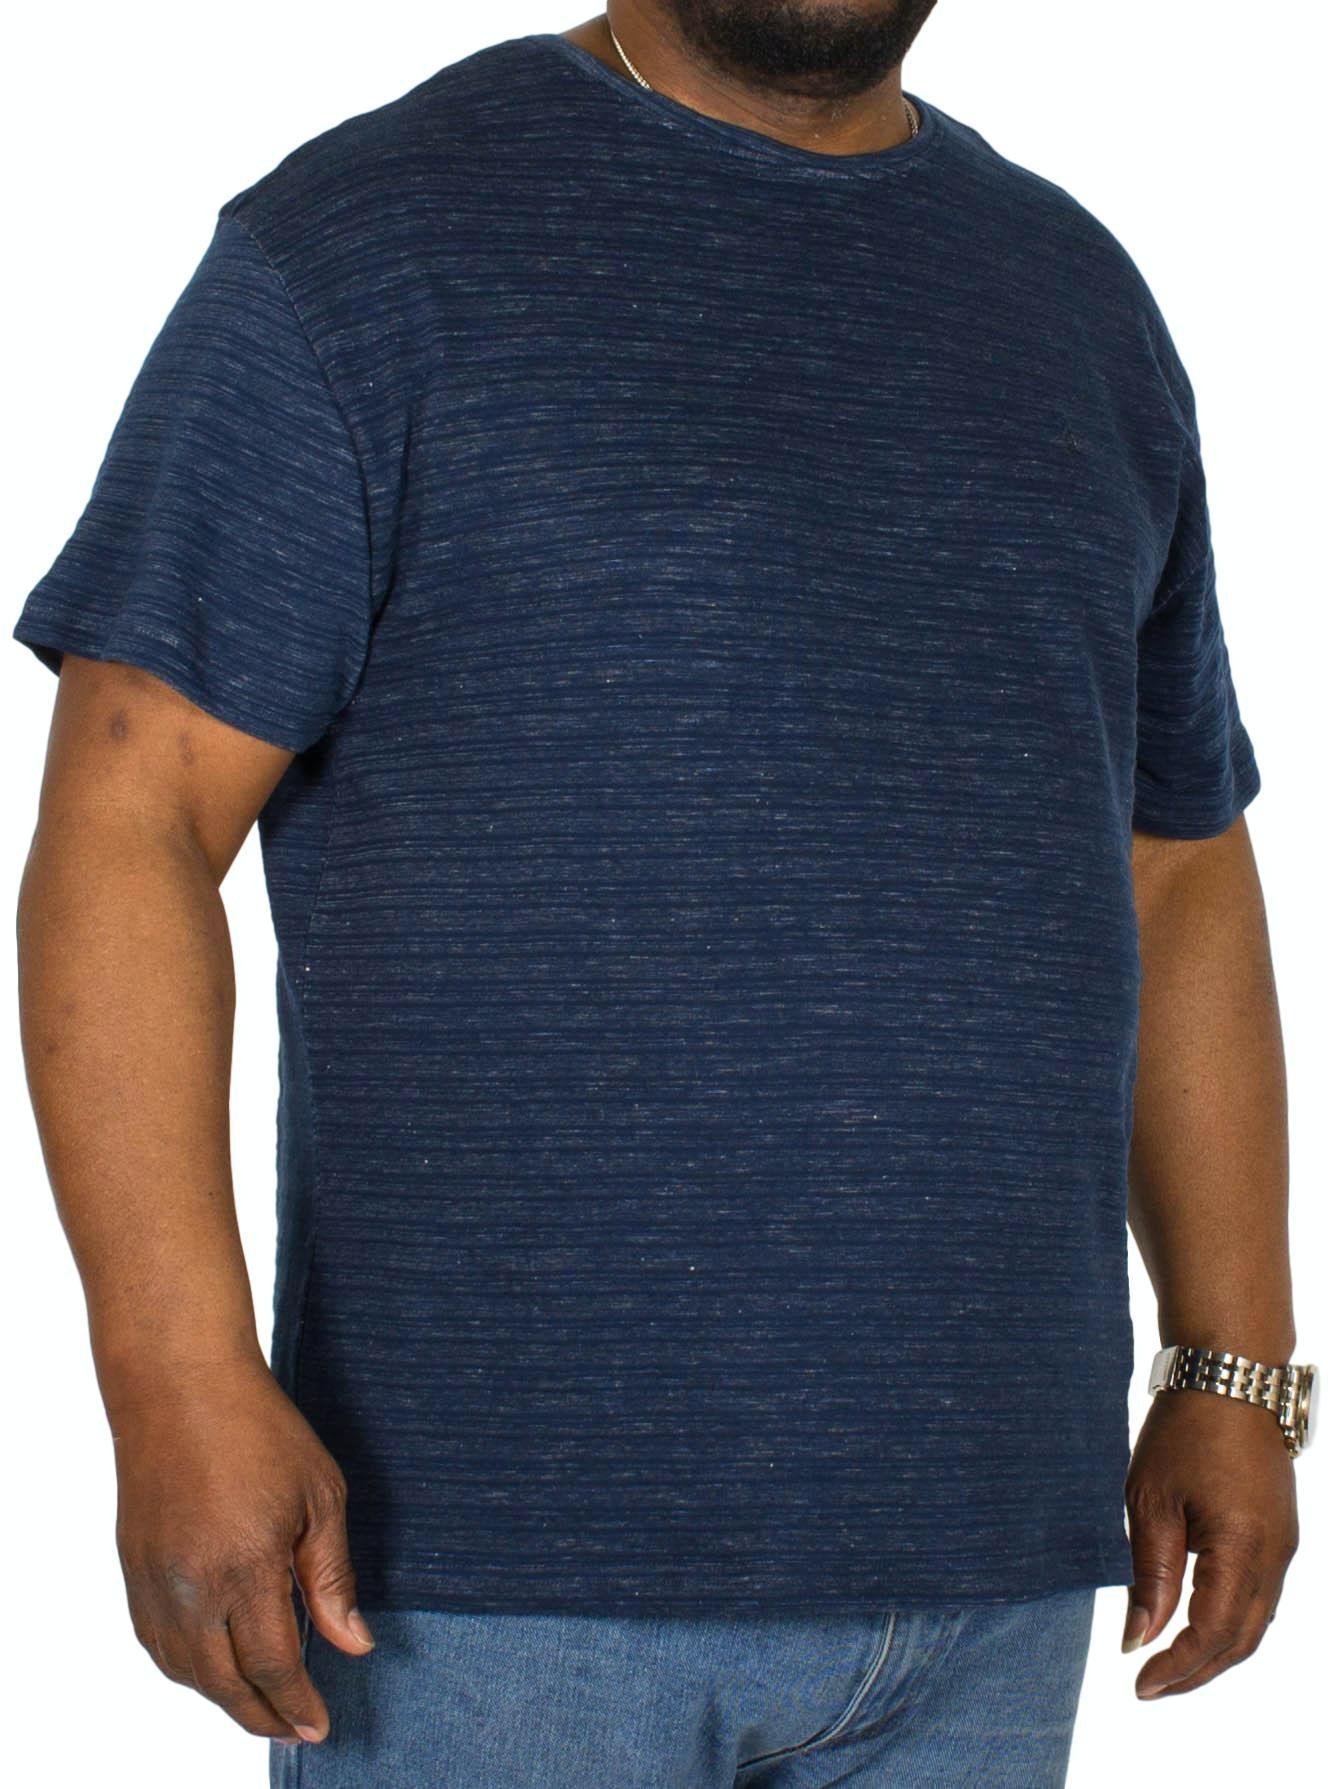 Replika Yarn Dyed T-Shirt Navy